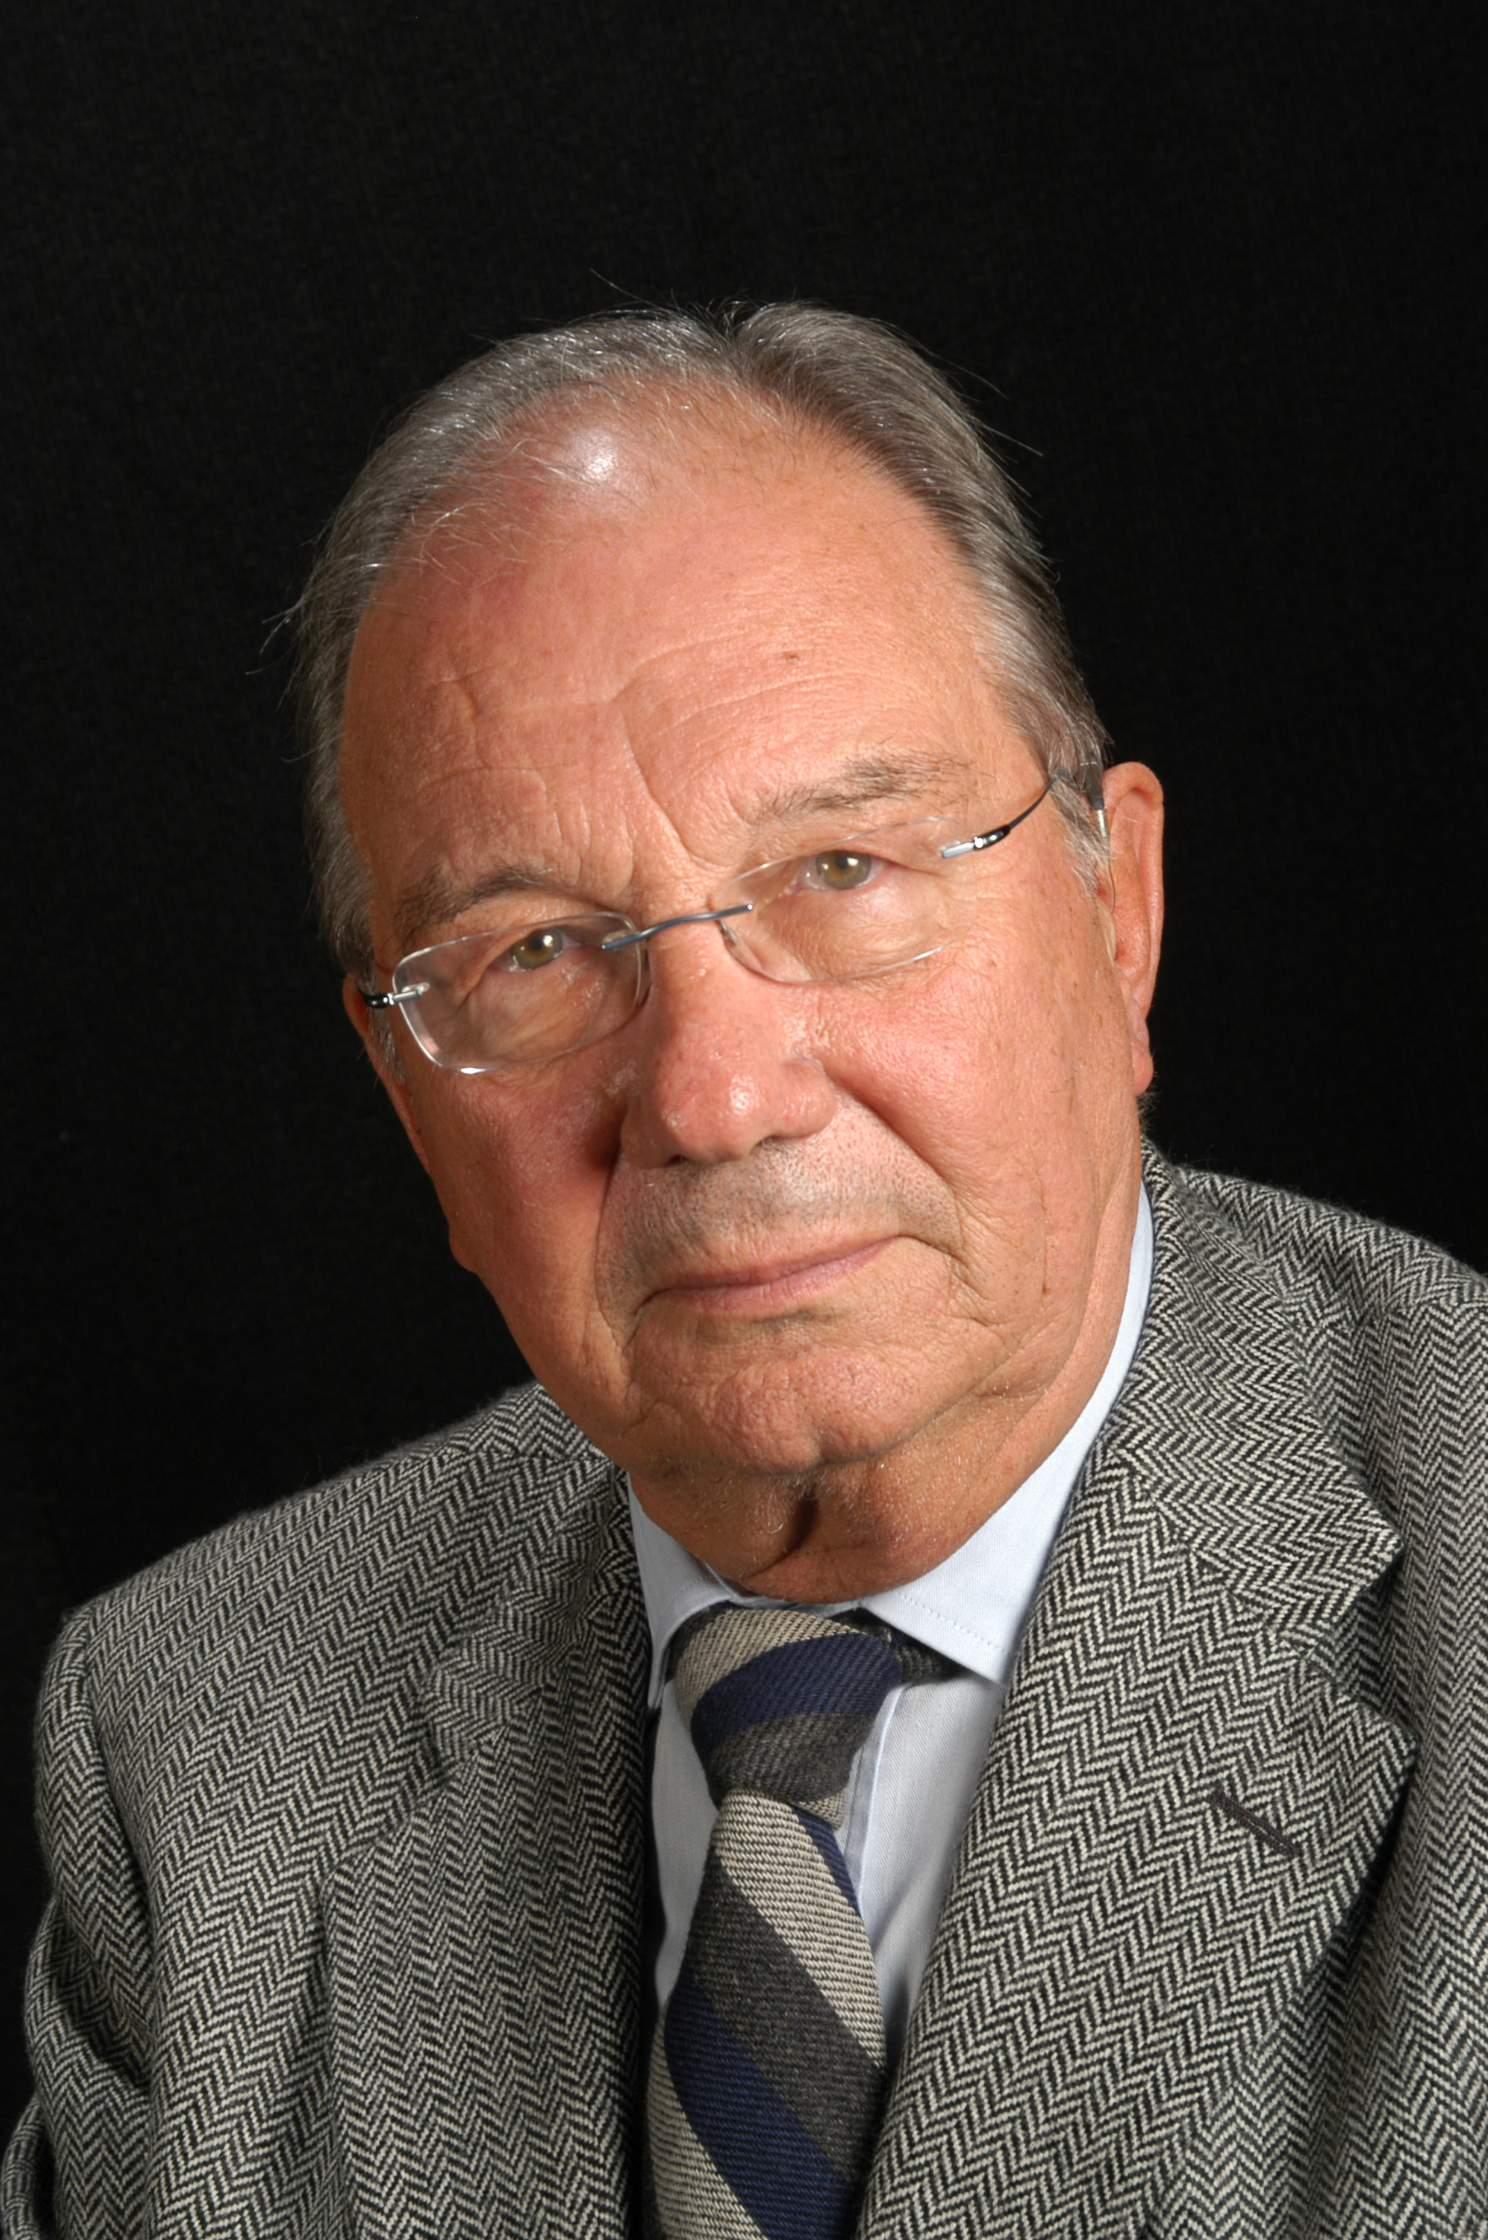 Sr. Josep Pujadas i Domingo